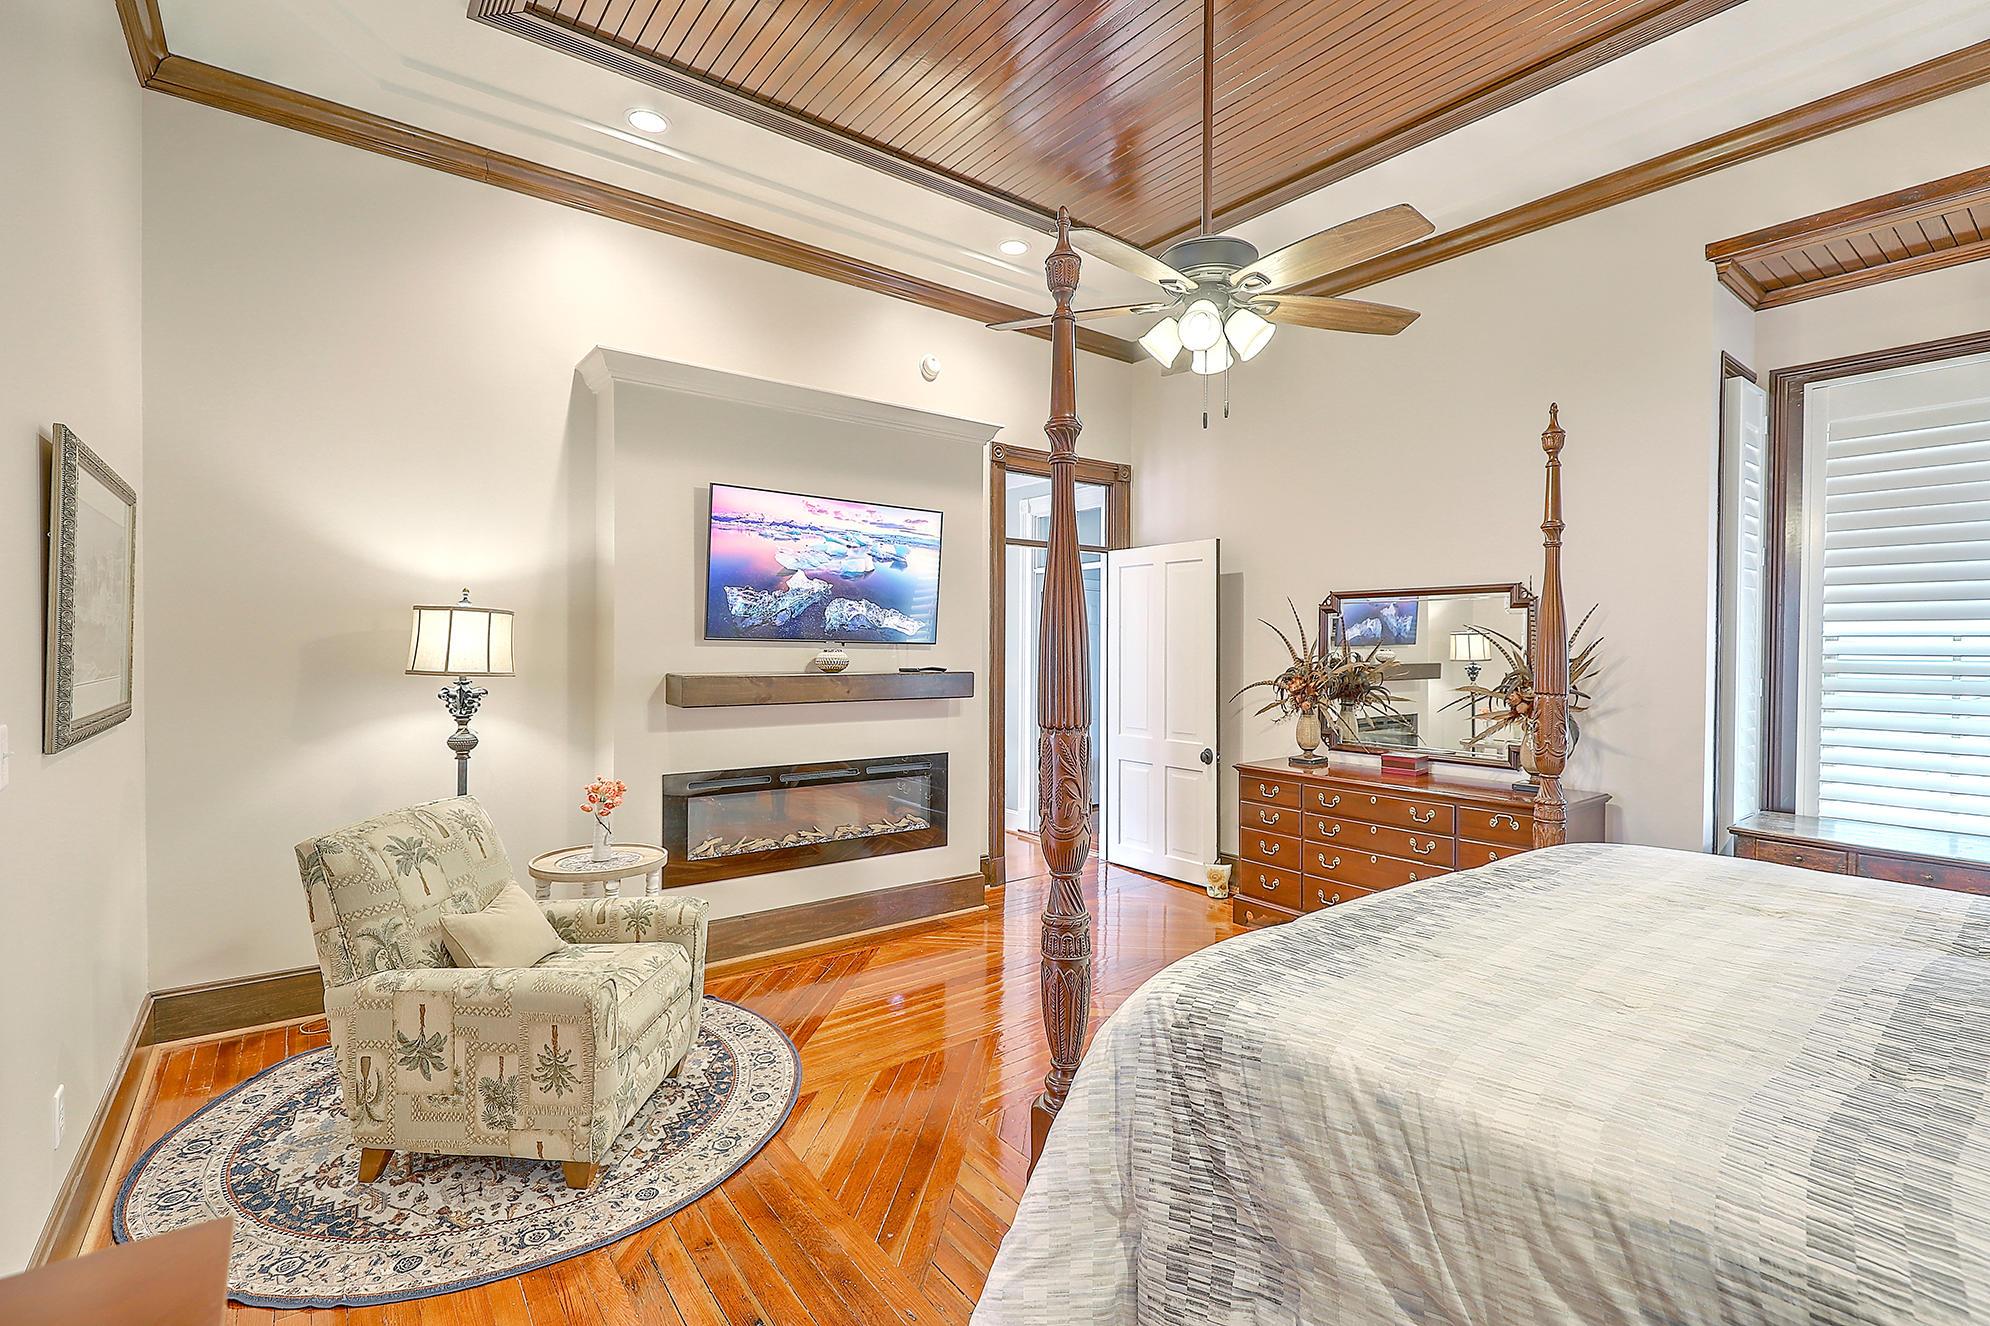 Summerville Homes For Sale - 102 Hickory, Summerville, SC - 102